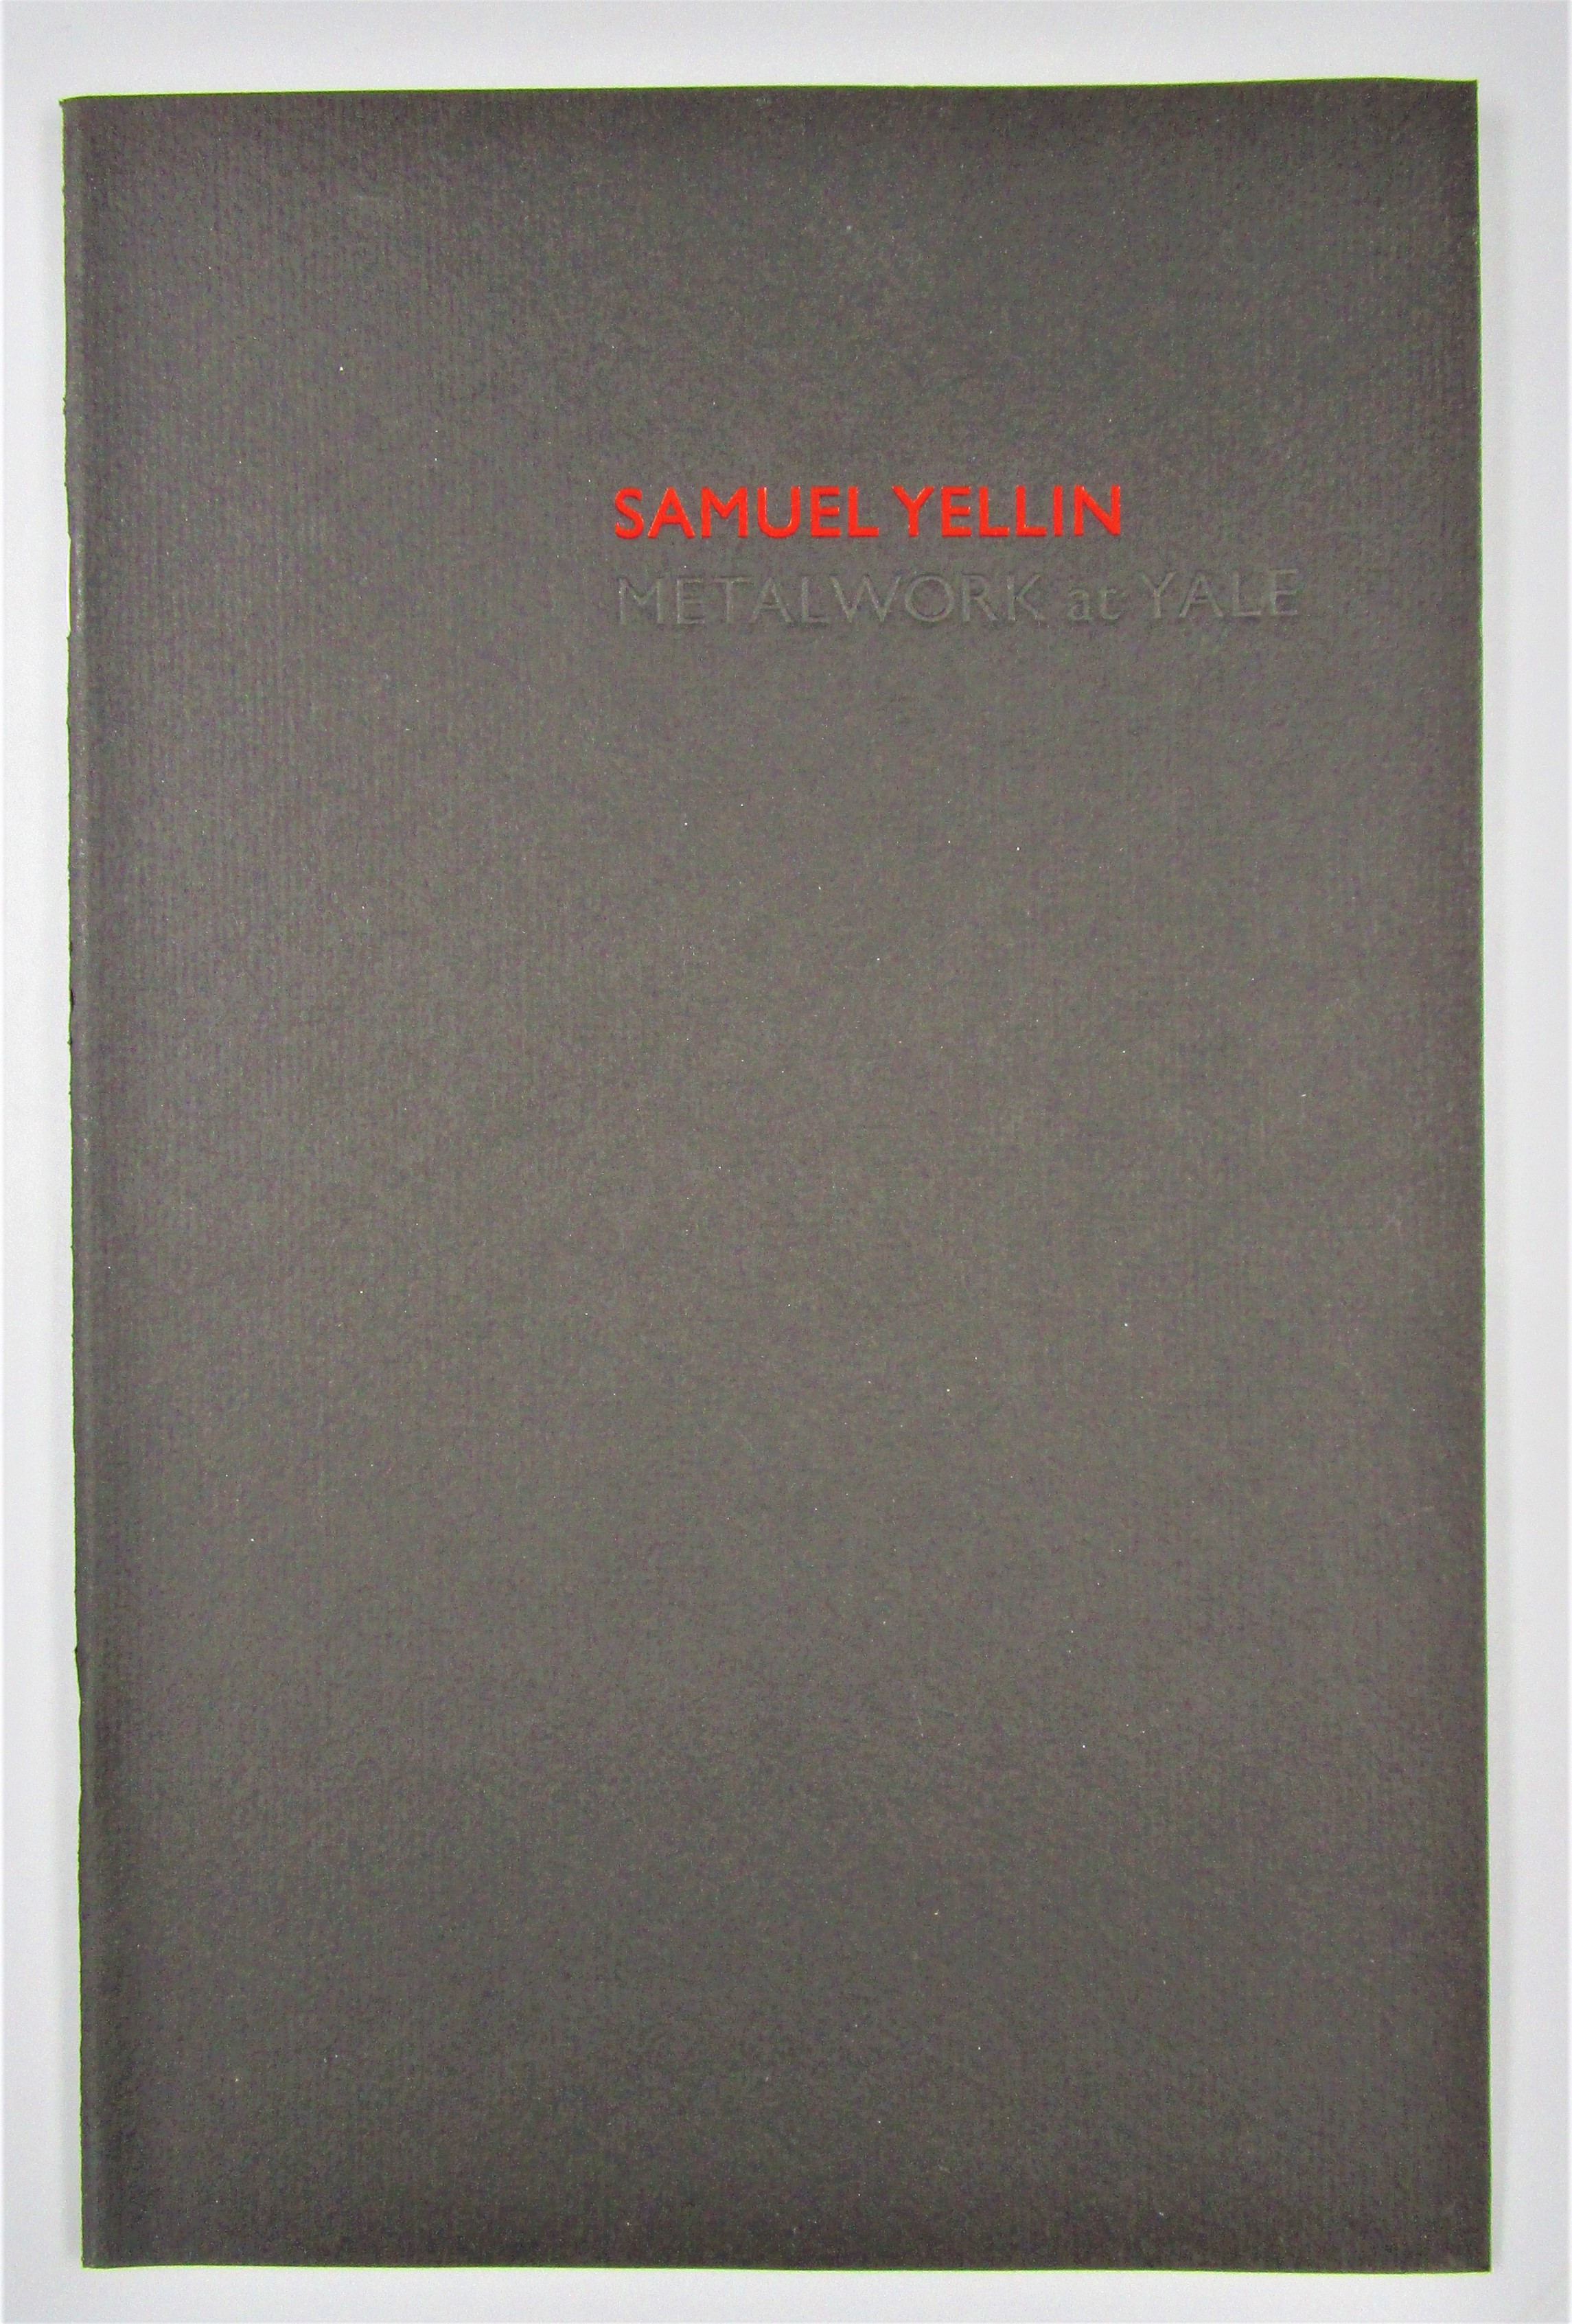 SAMUEL YELLIN: METALWORK AT YALE - 1990